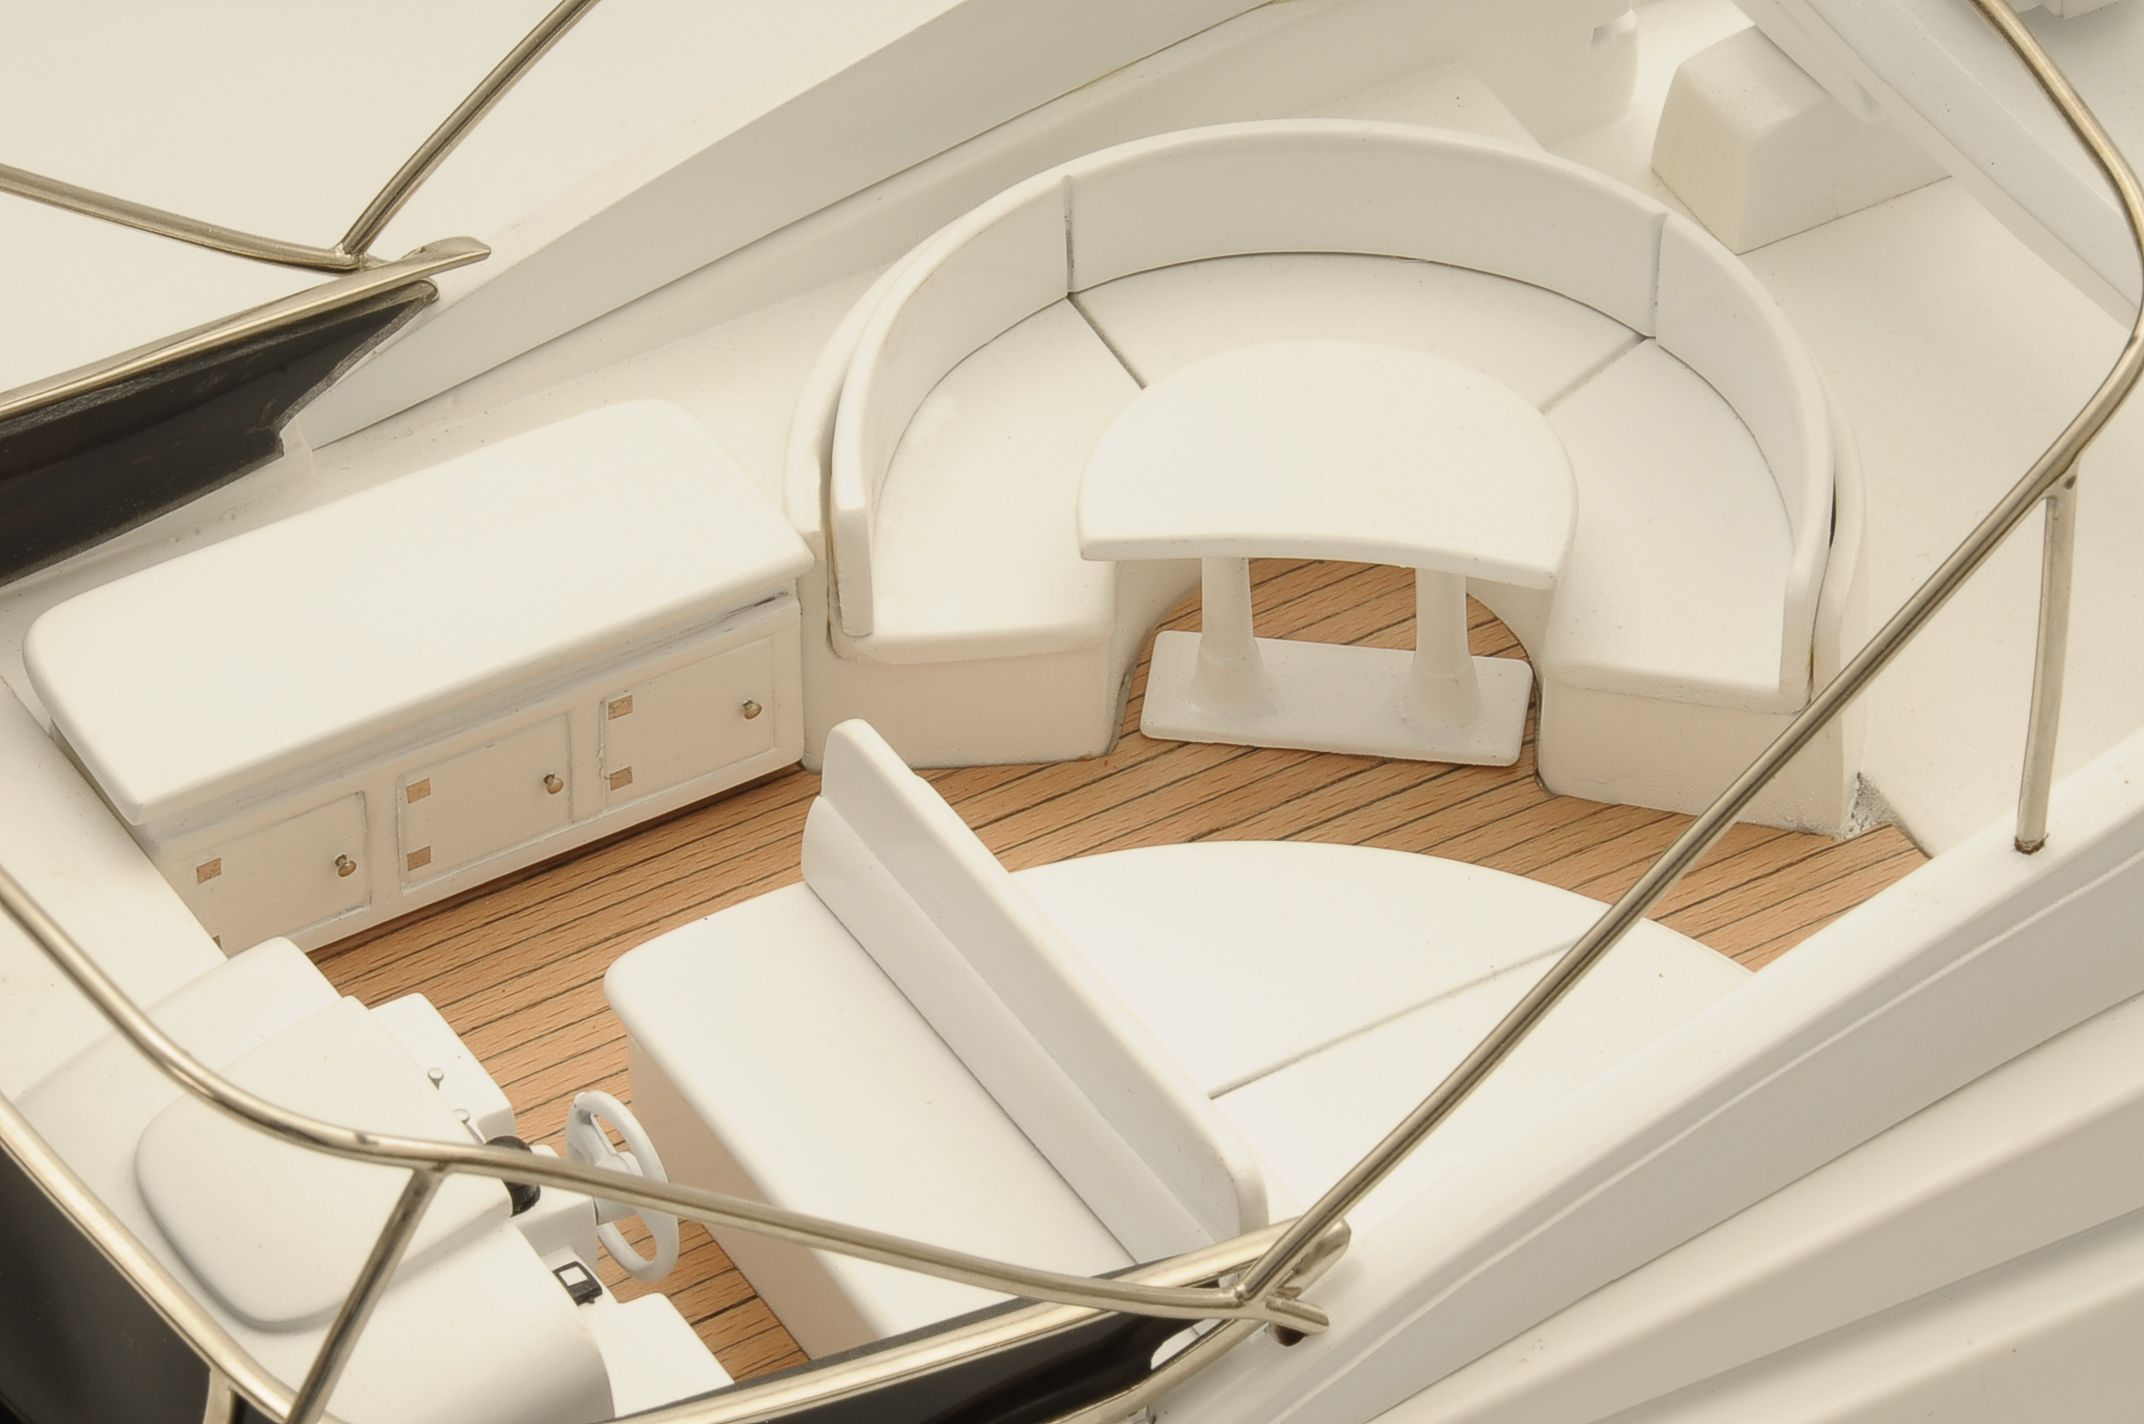 1236-6362-Astondoa-72-GLX-Motor-Yacht-Premier-Range